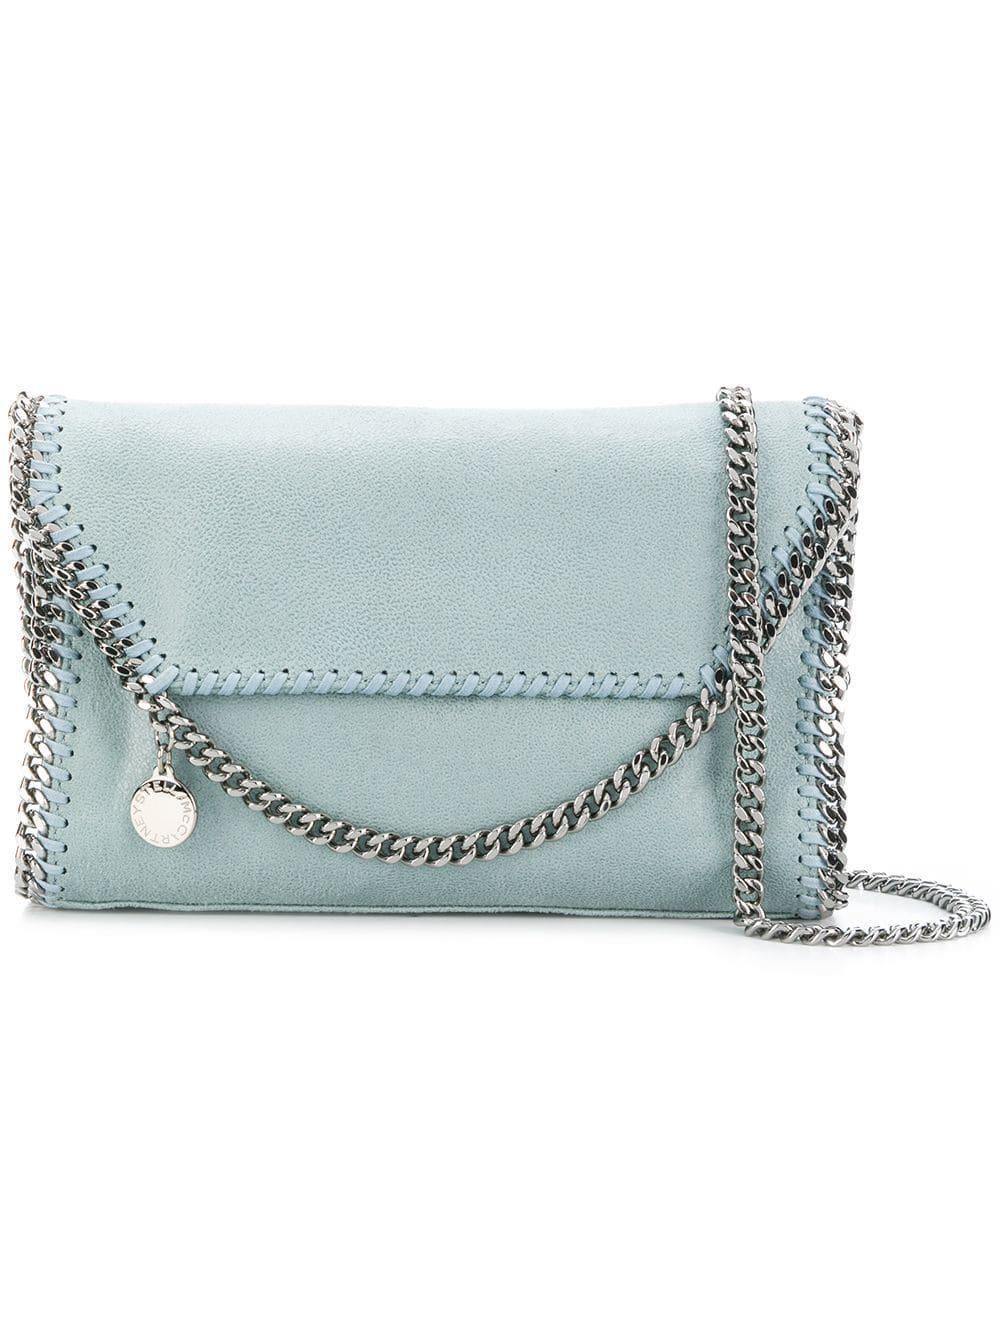 a053fd29683 Stella Mccartney Falabella Mini Shoulder Bag in Blue - Lyst